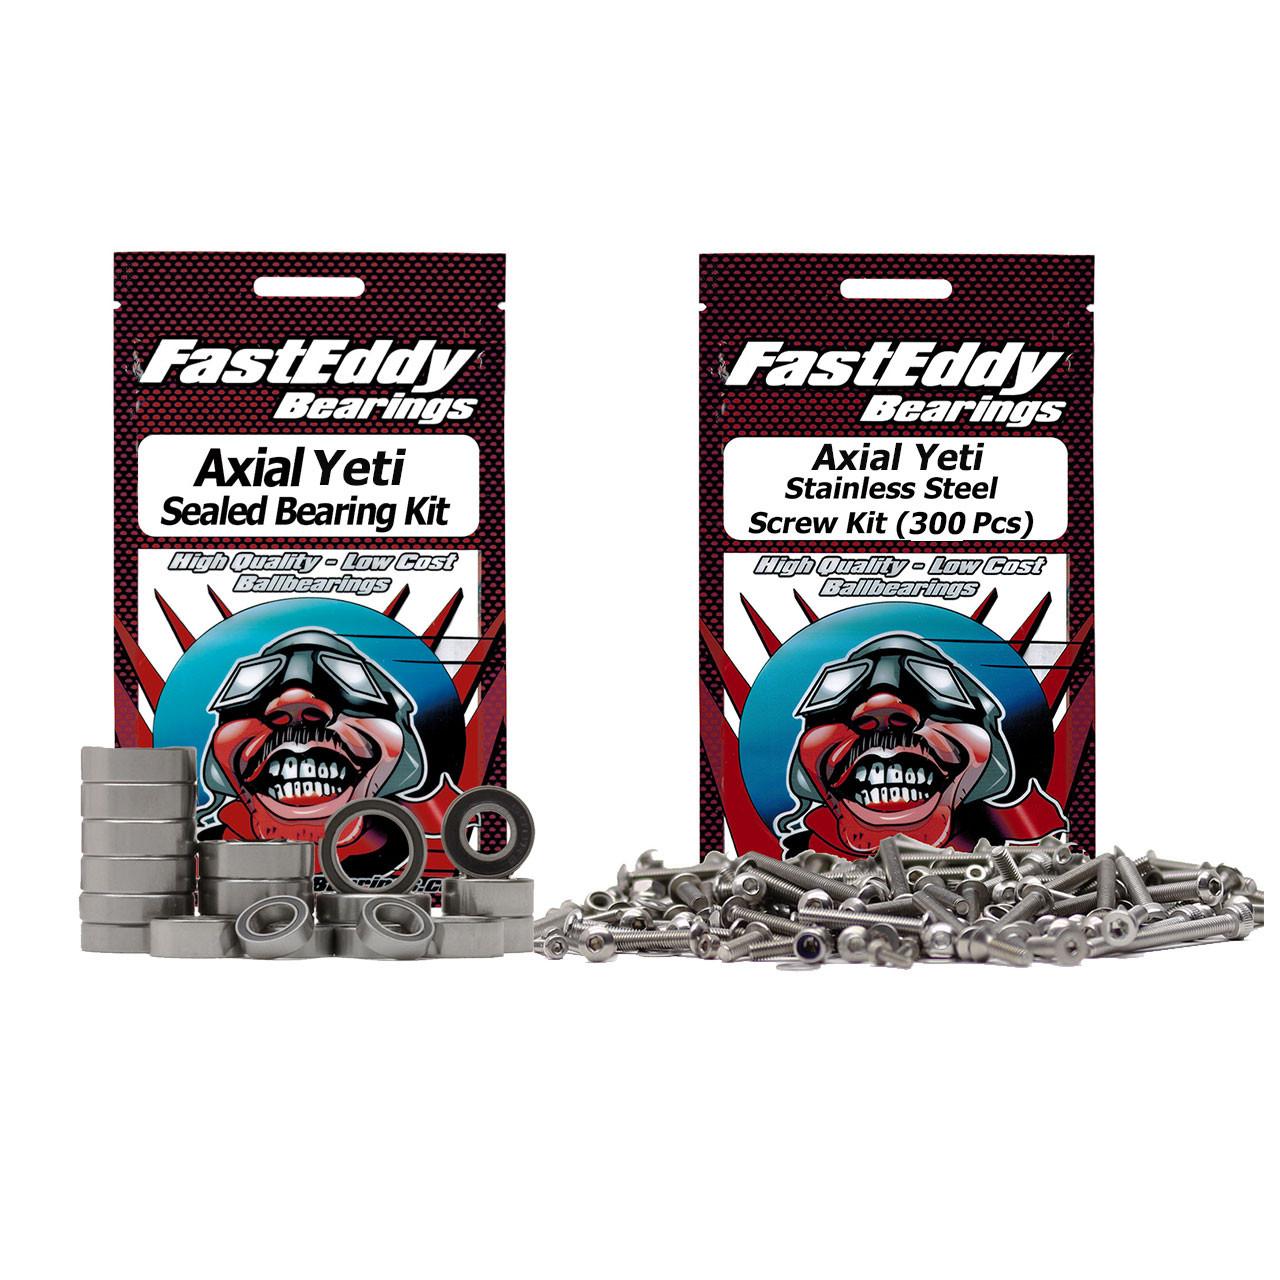 Axial Yeti Bearing and Screw Kit Combo